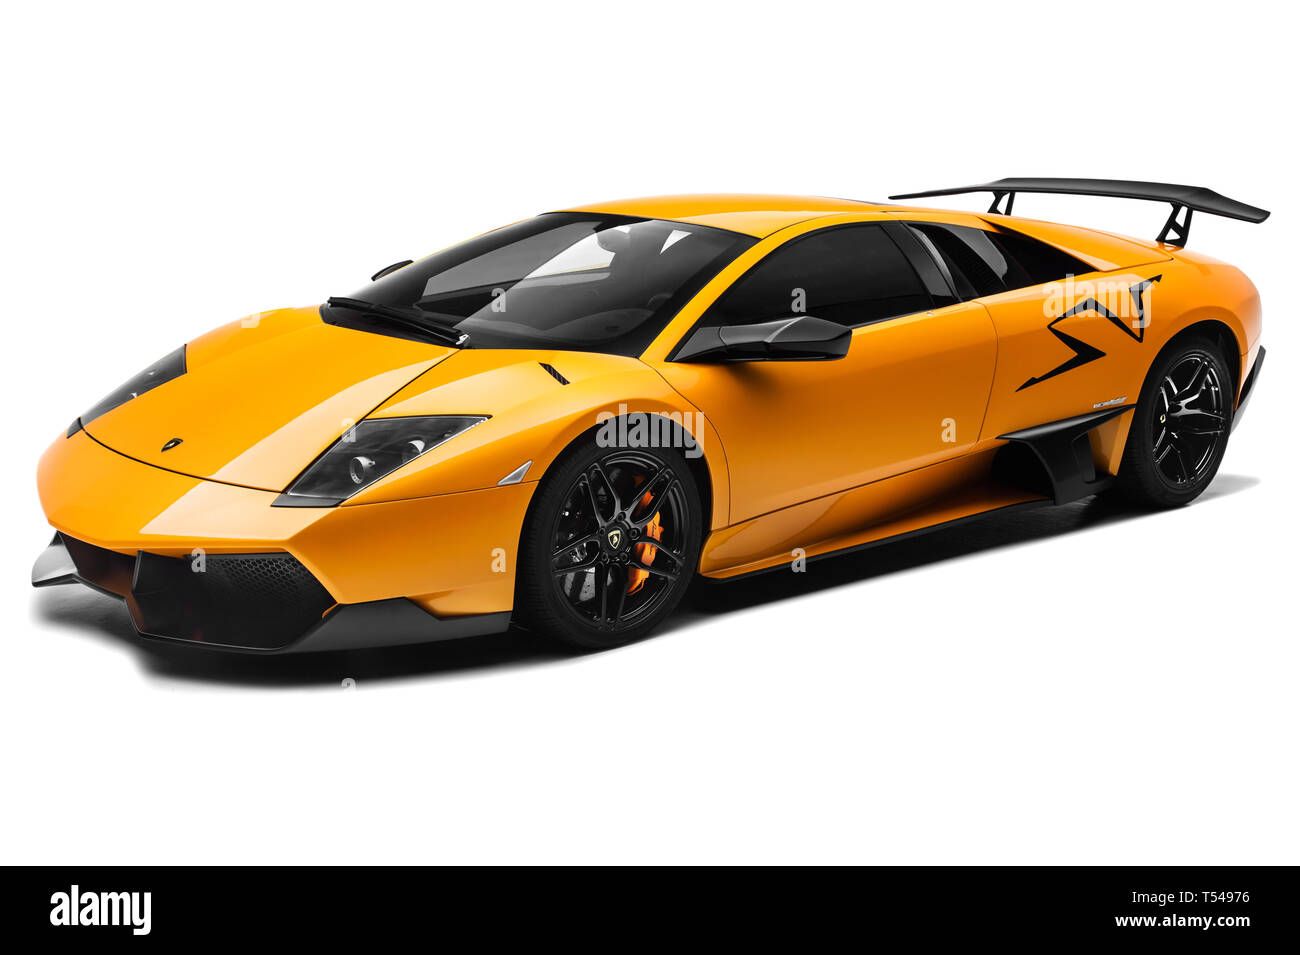 Lamborghini Murcielago Sv Stock Photo Alamy